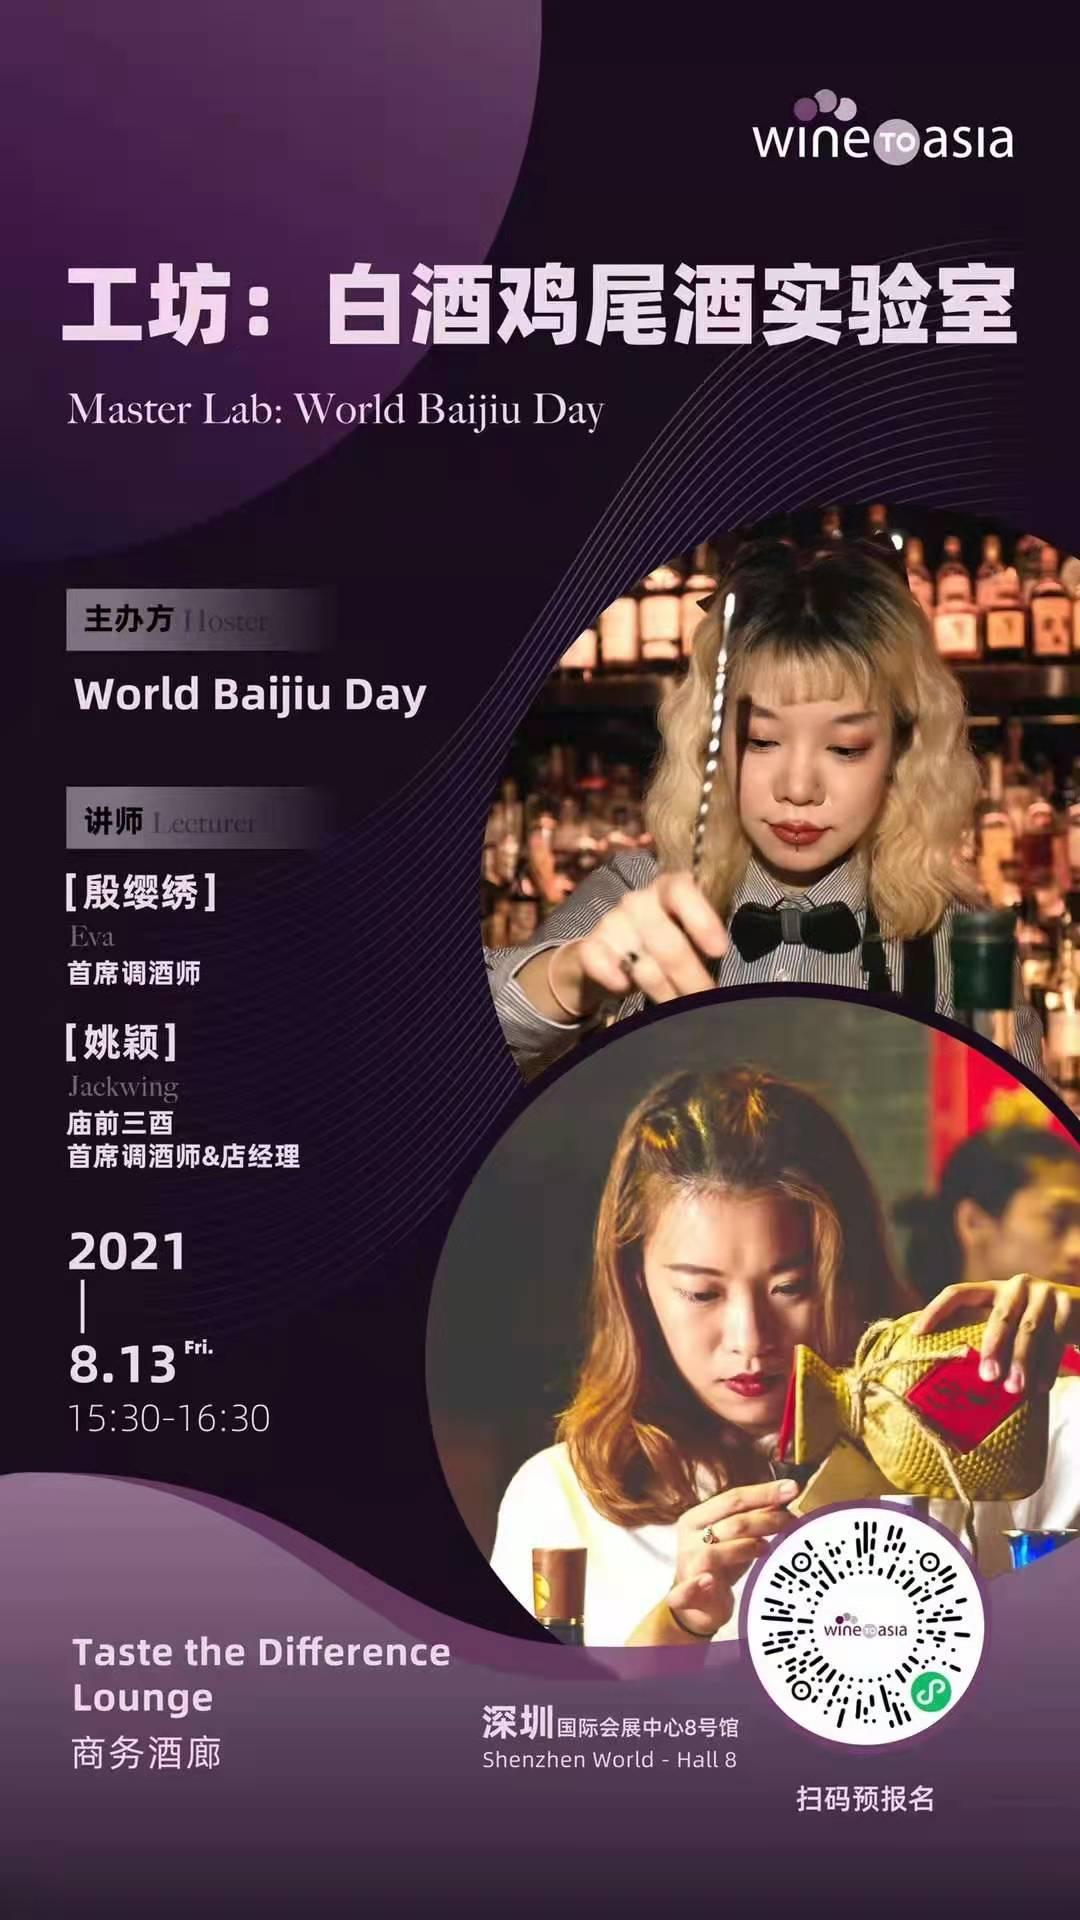 world-baijiu-day-wine-to-asia-baijiu-cocktail-class-compass-bar-sanyou